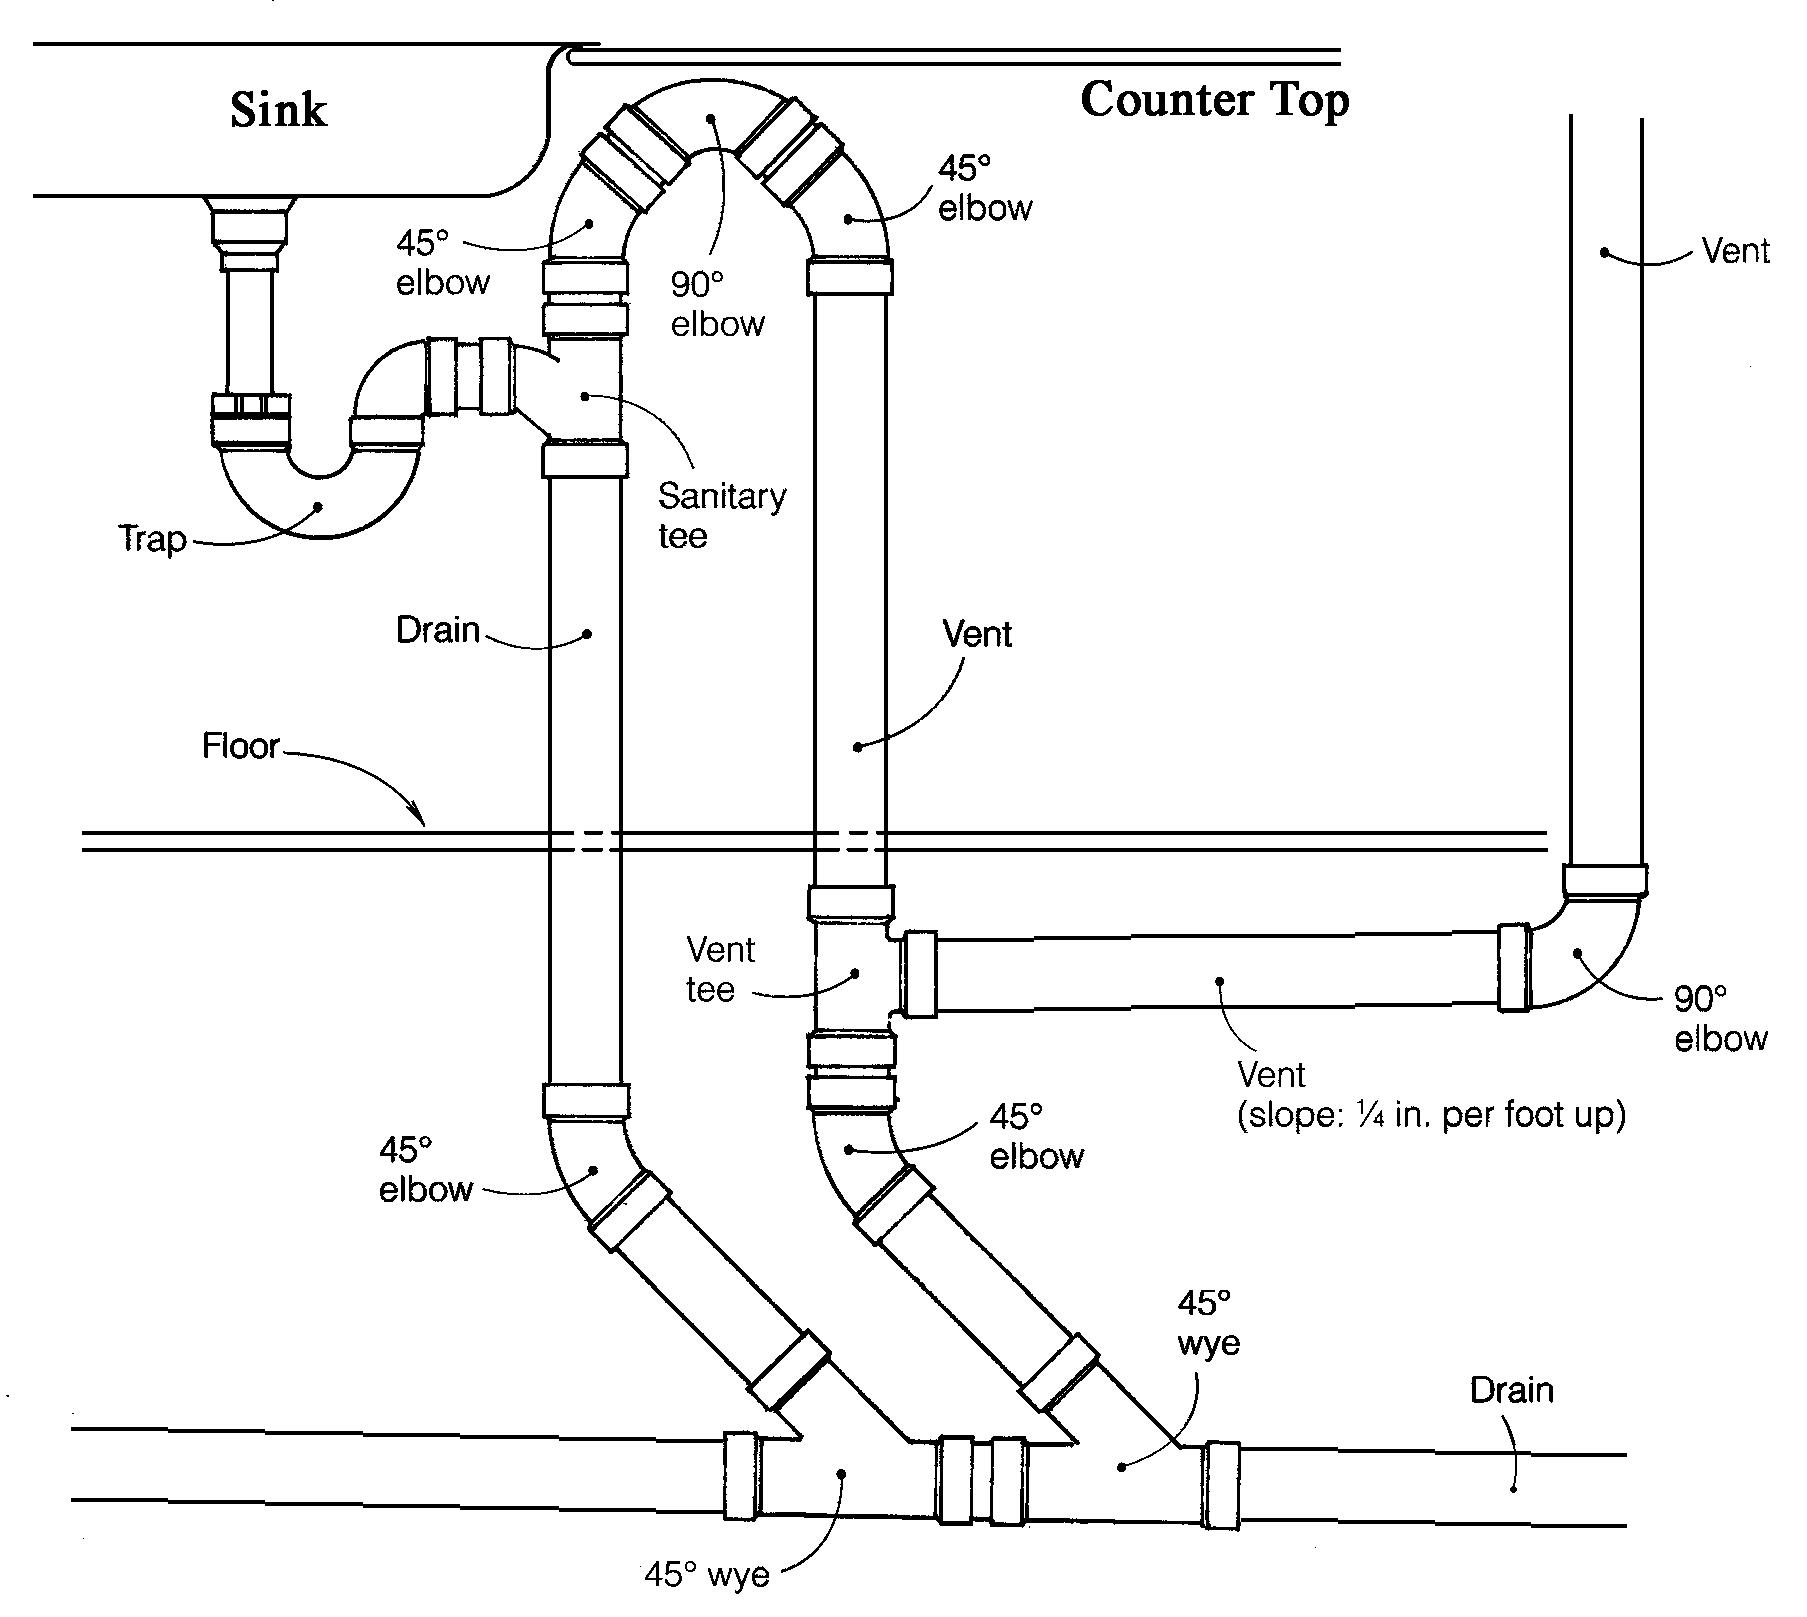 sewer diagram for house etl process flow example pluislandsink tiny pinterest plumbing vent